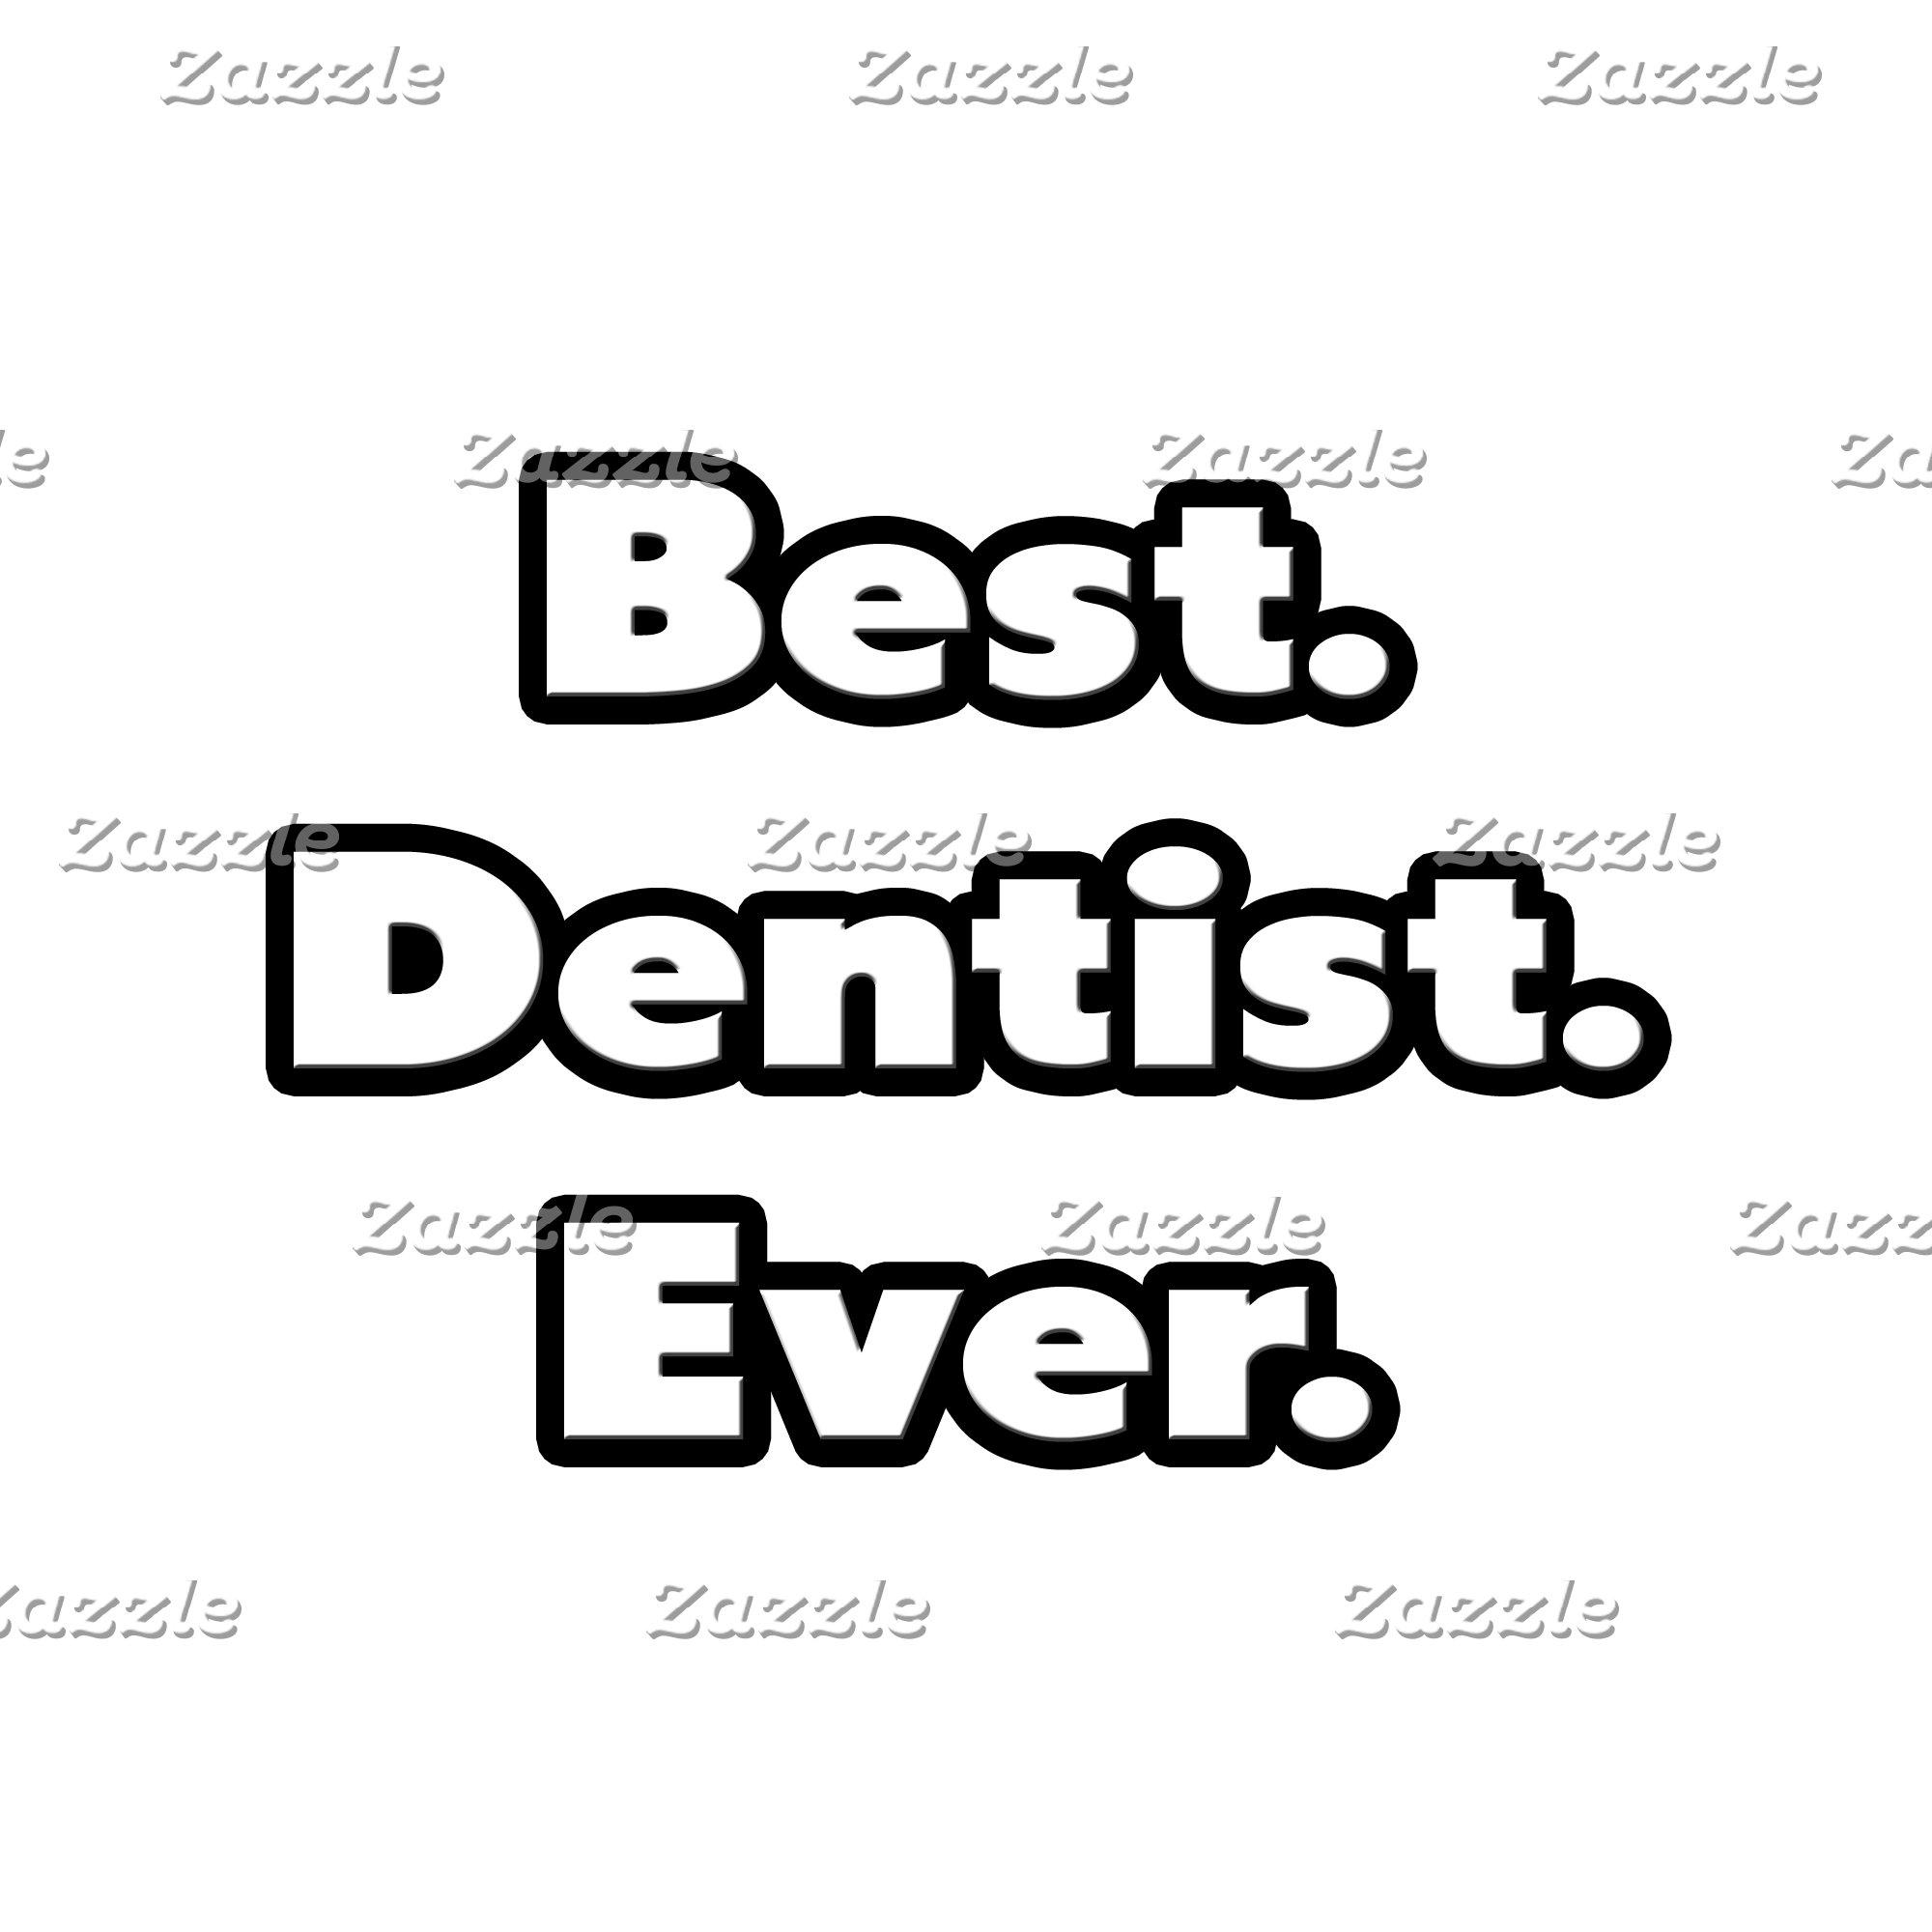 Best. Dentist. Ever.